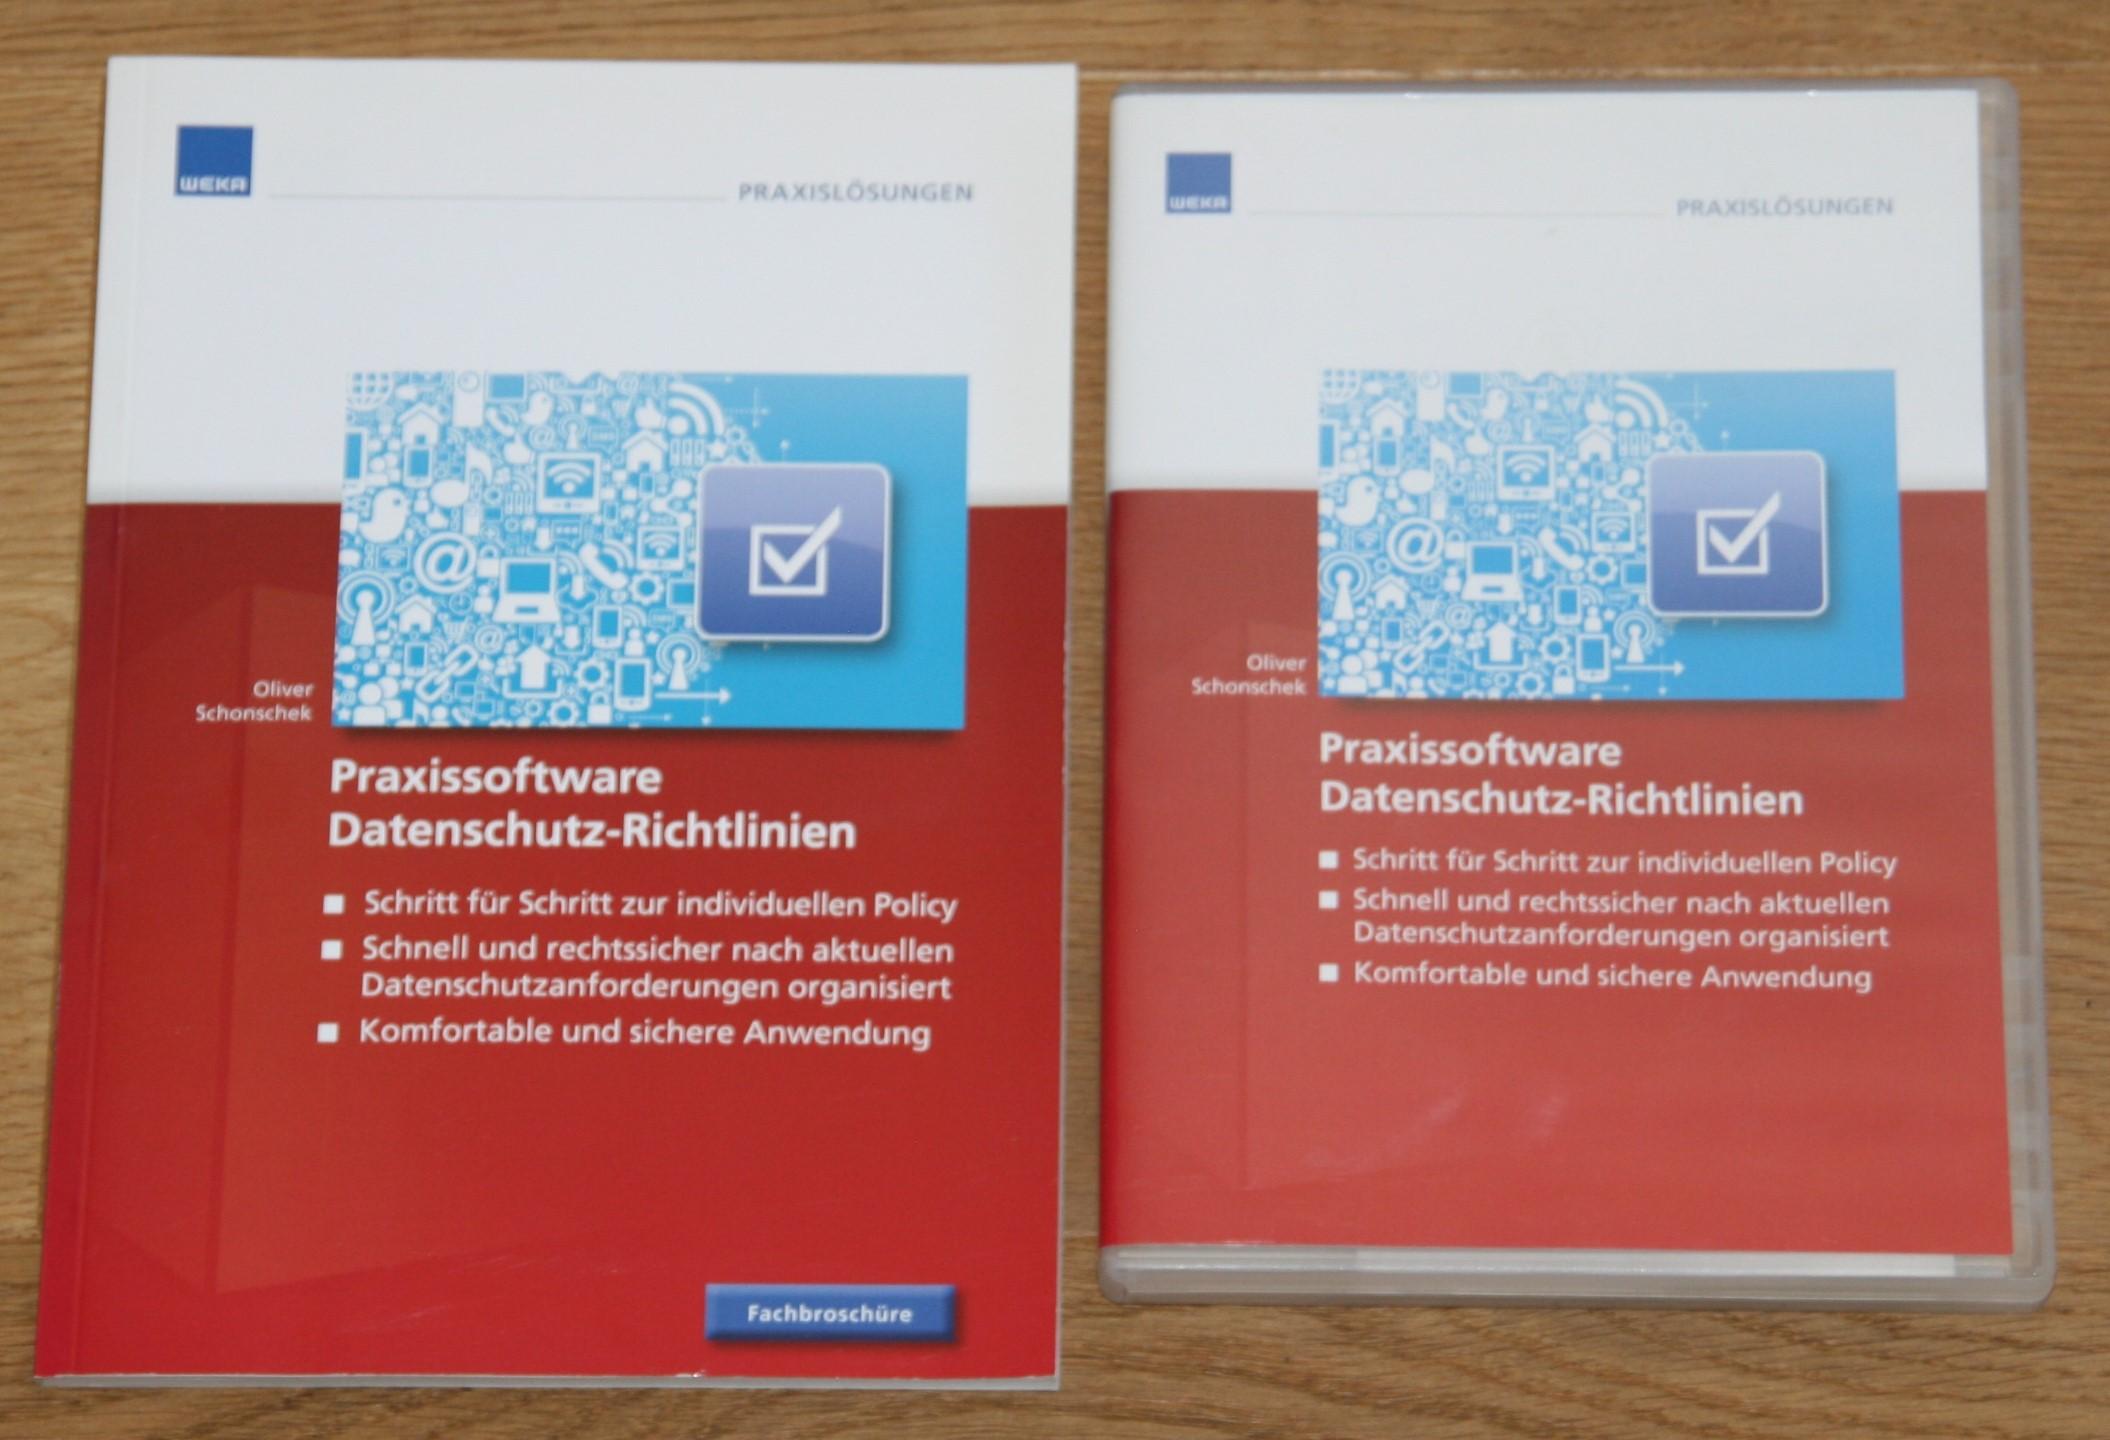 Praxissoftware Datenschutz-Richtlinien. CD-ROM + Fachbroschüre. [WEKA Praxislösungen] Stand 08/2012,